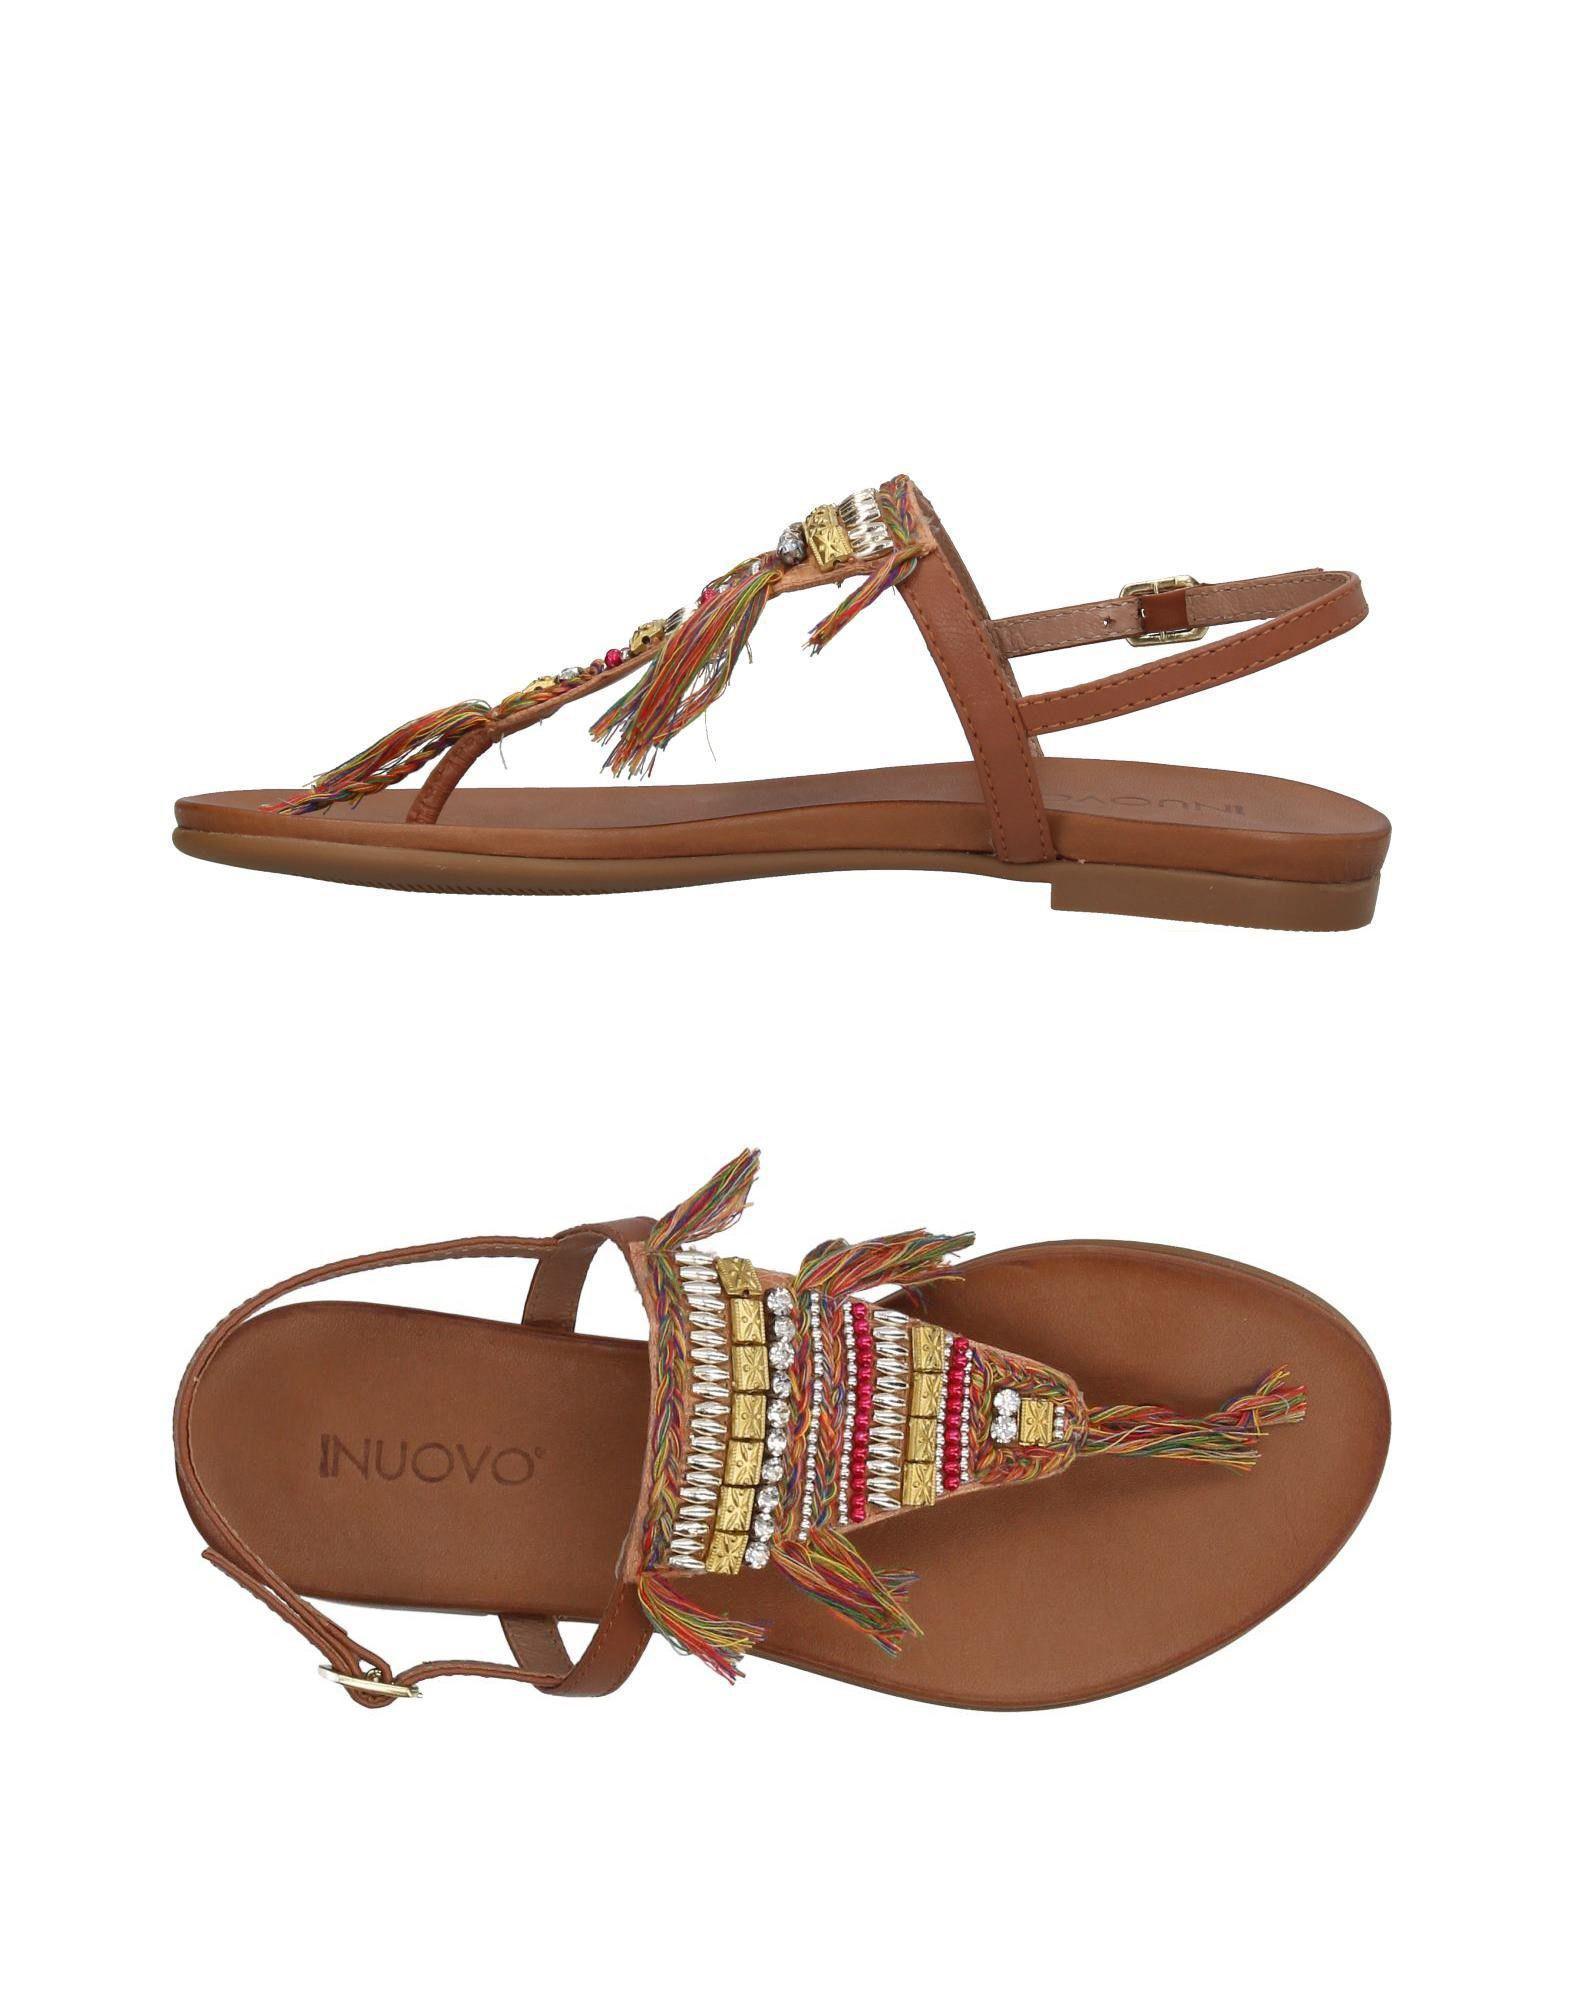 FOOTWEAR - Toe post sandals Inuovo uF9rz